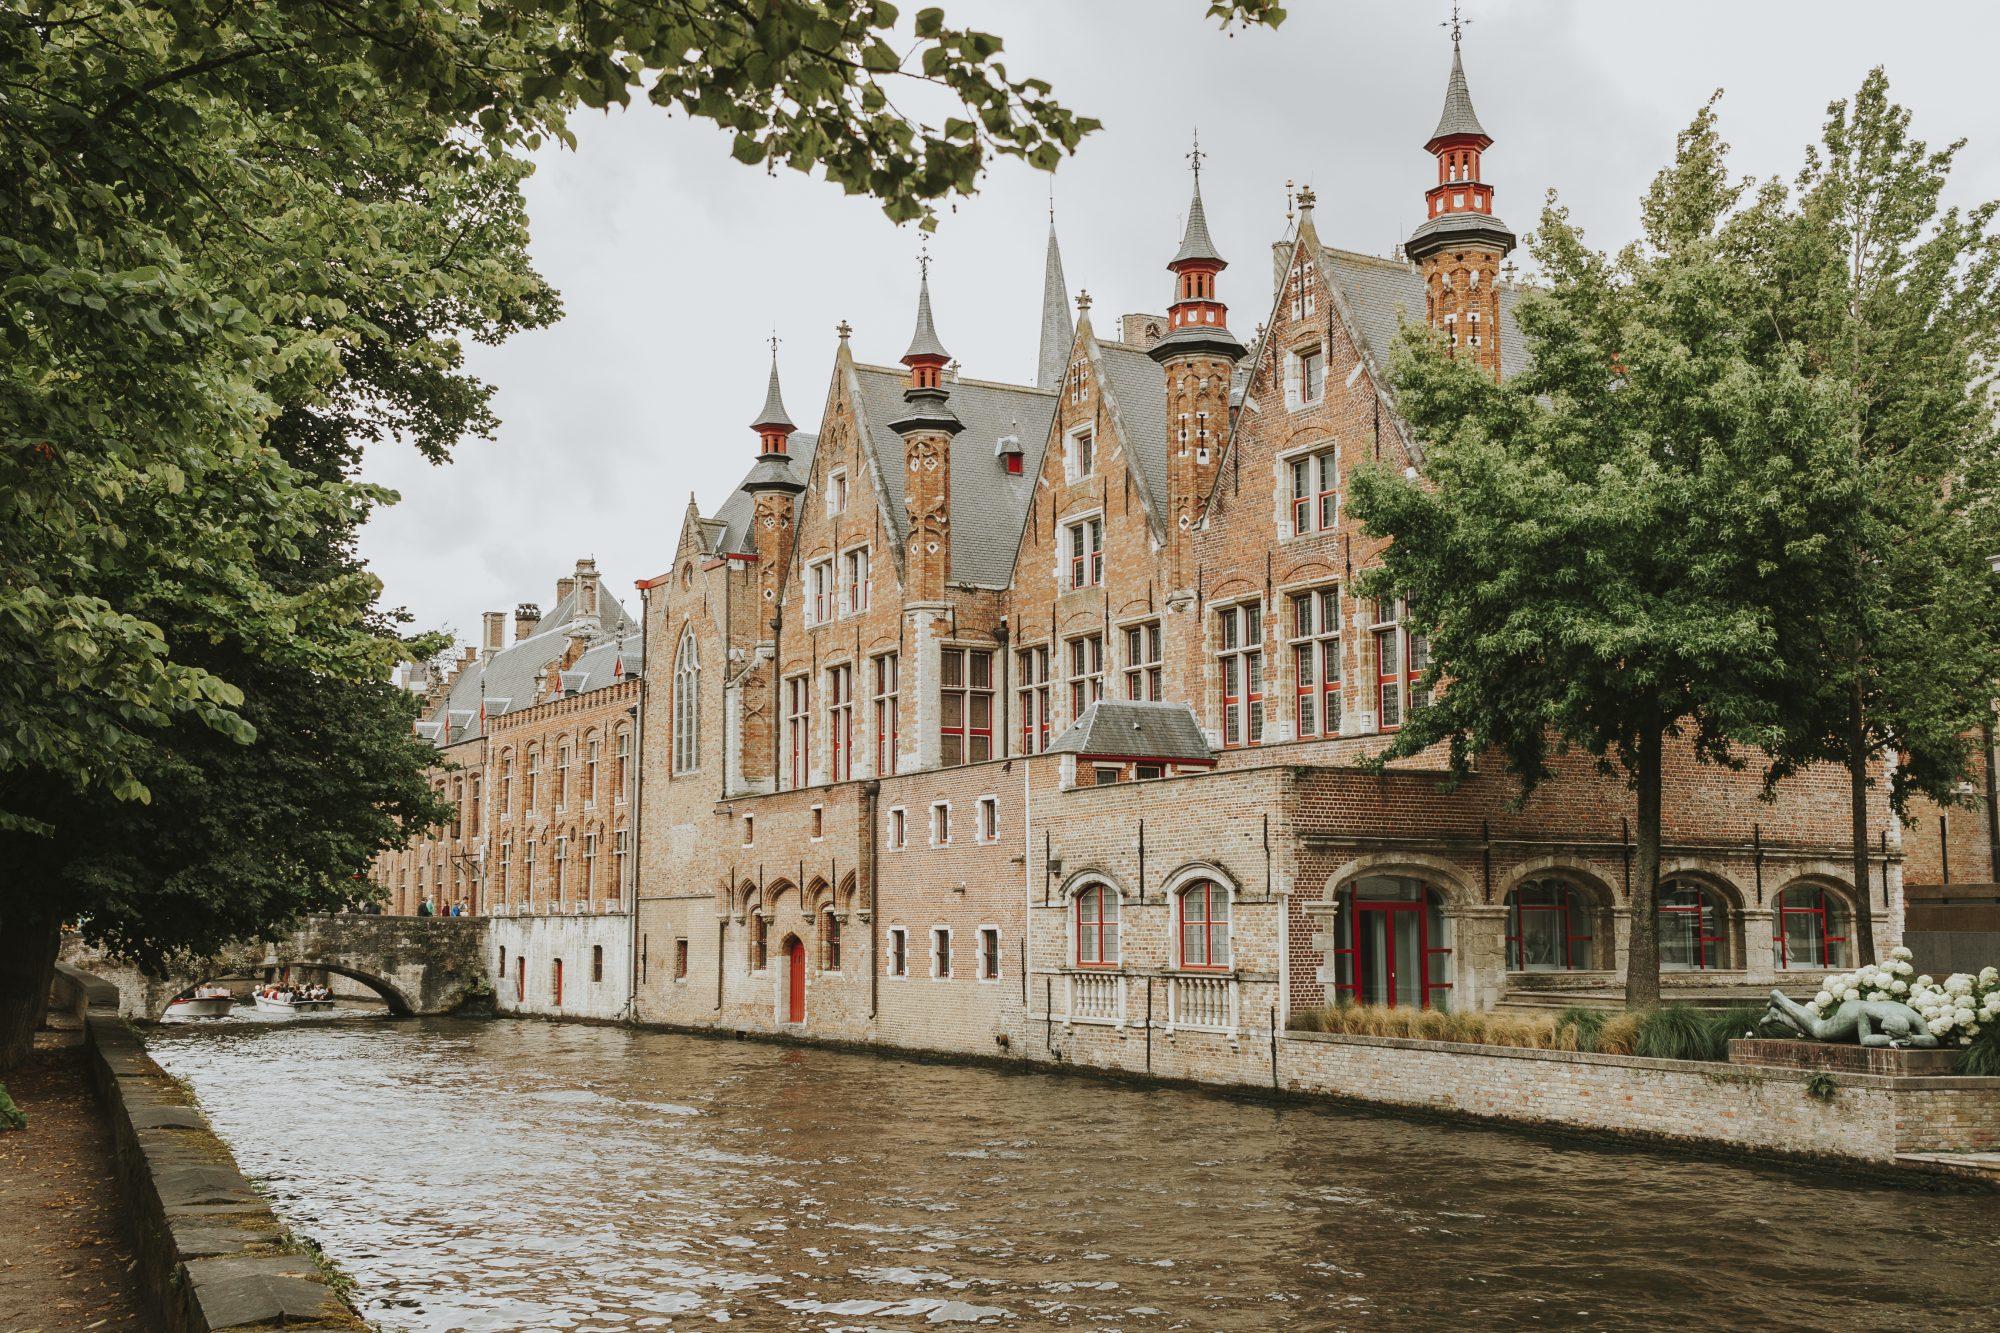 View of the Old Civil Registry, Bruges